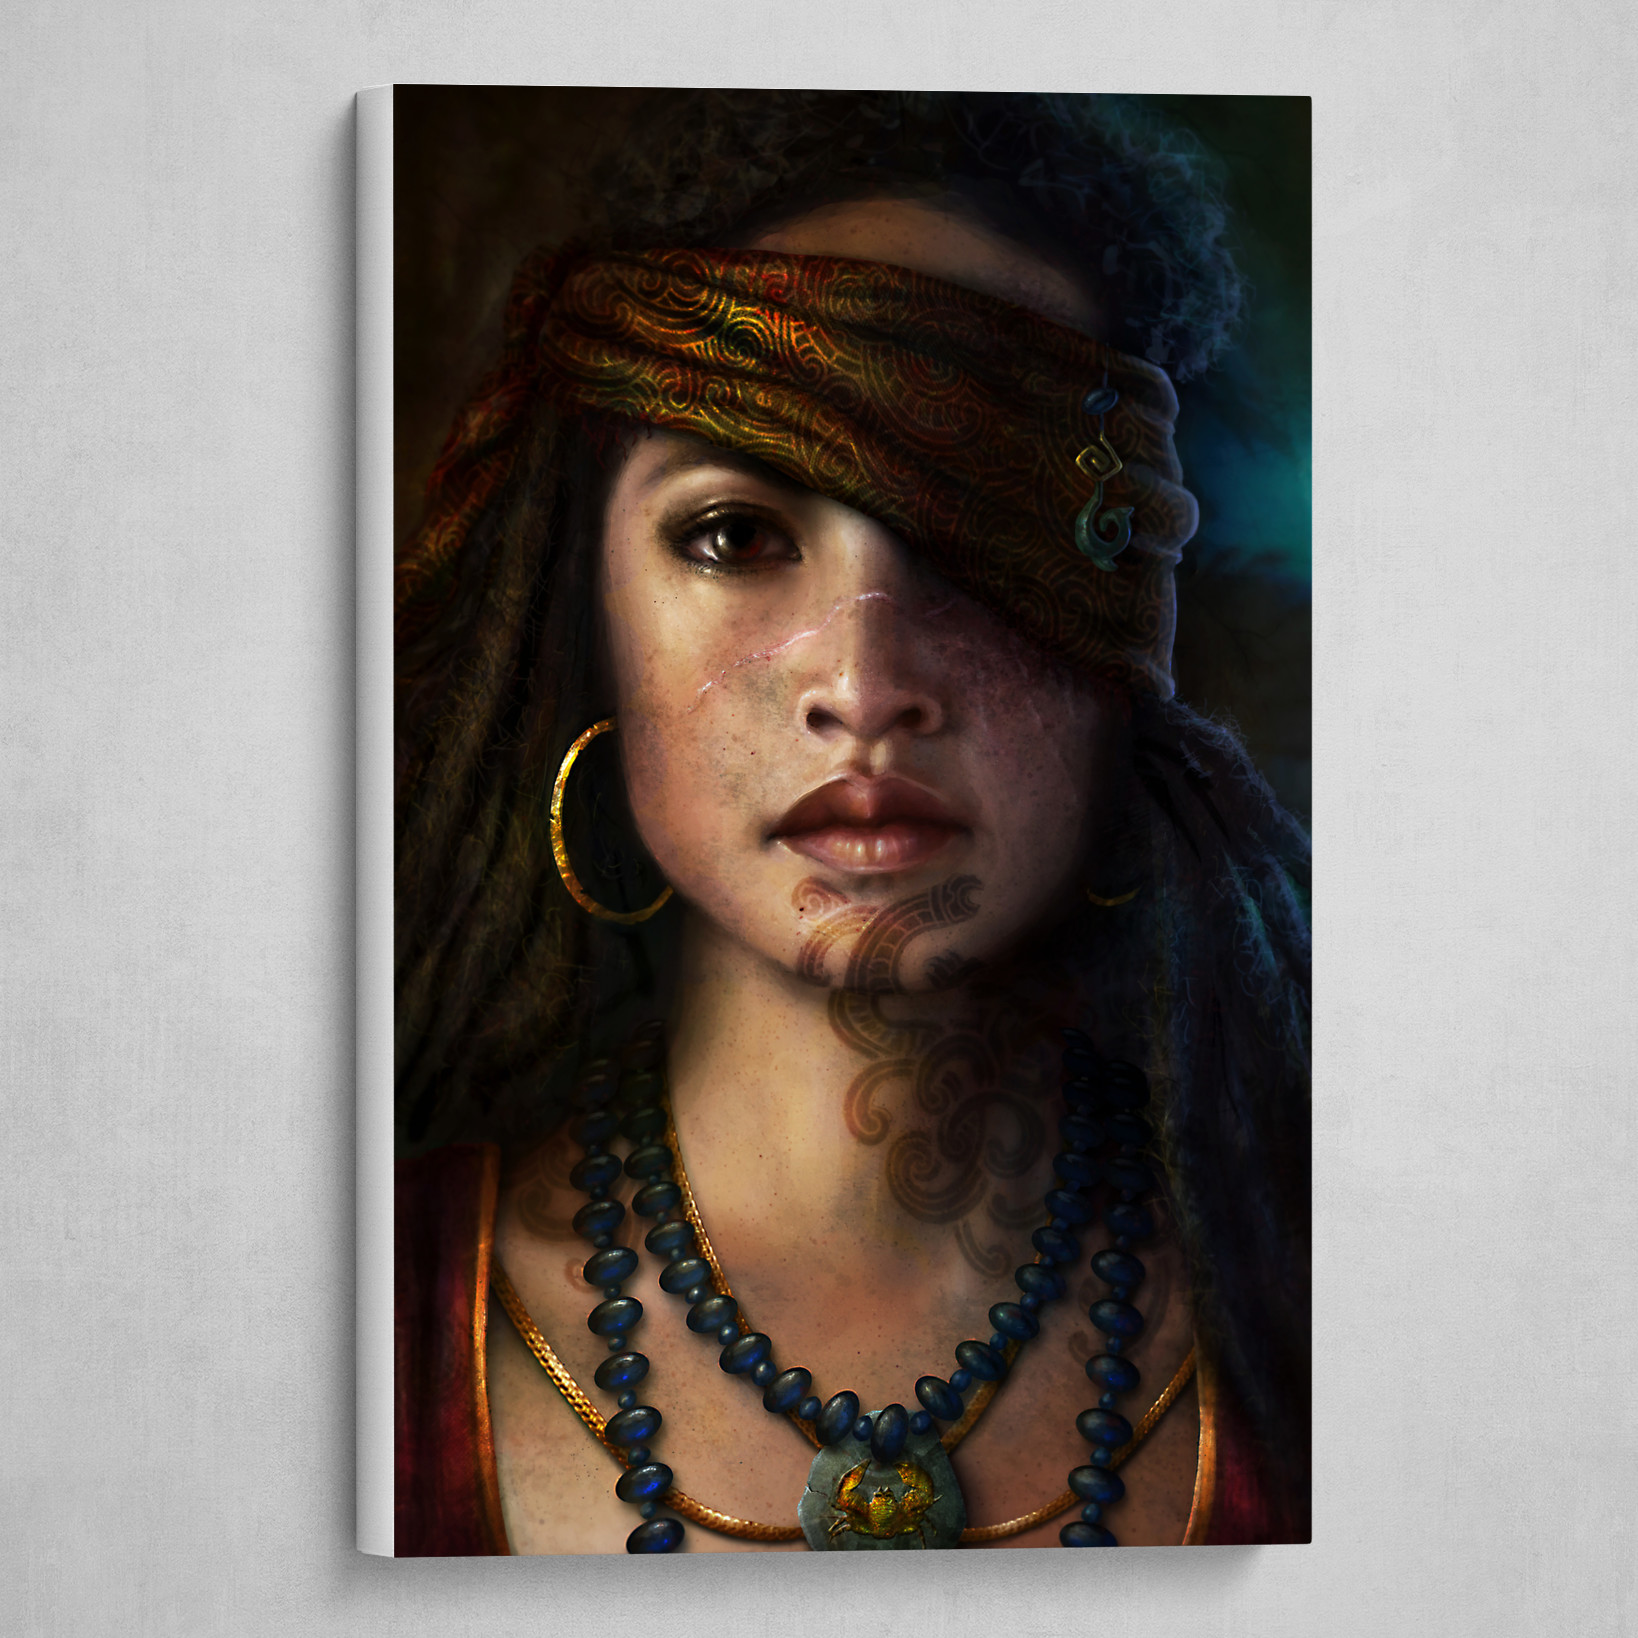 Maori Pirate Princess Portrait